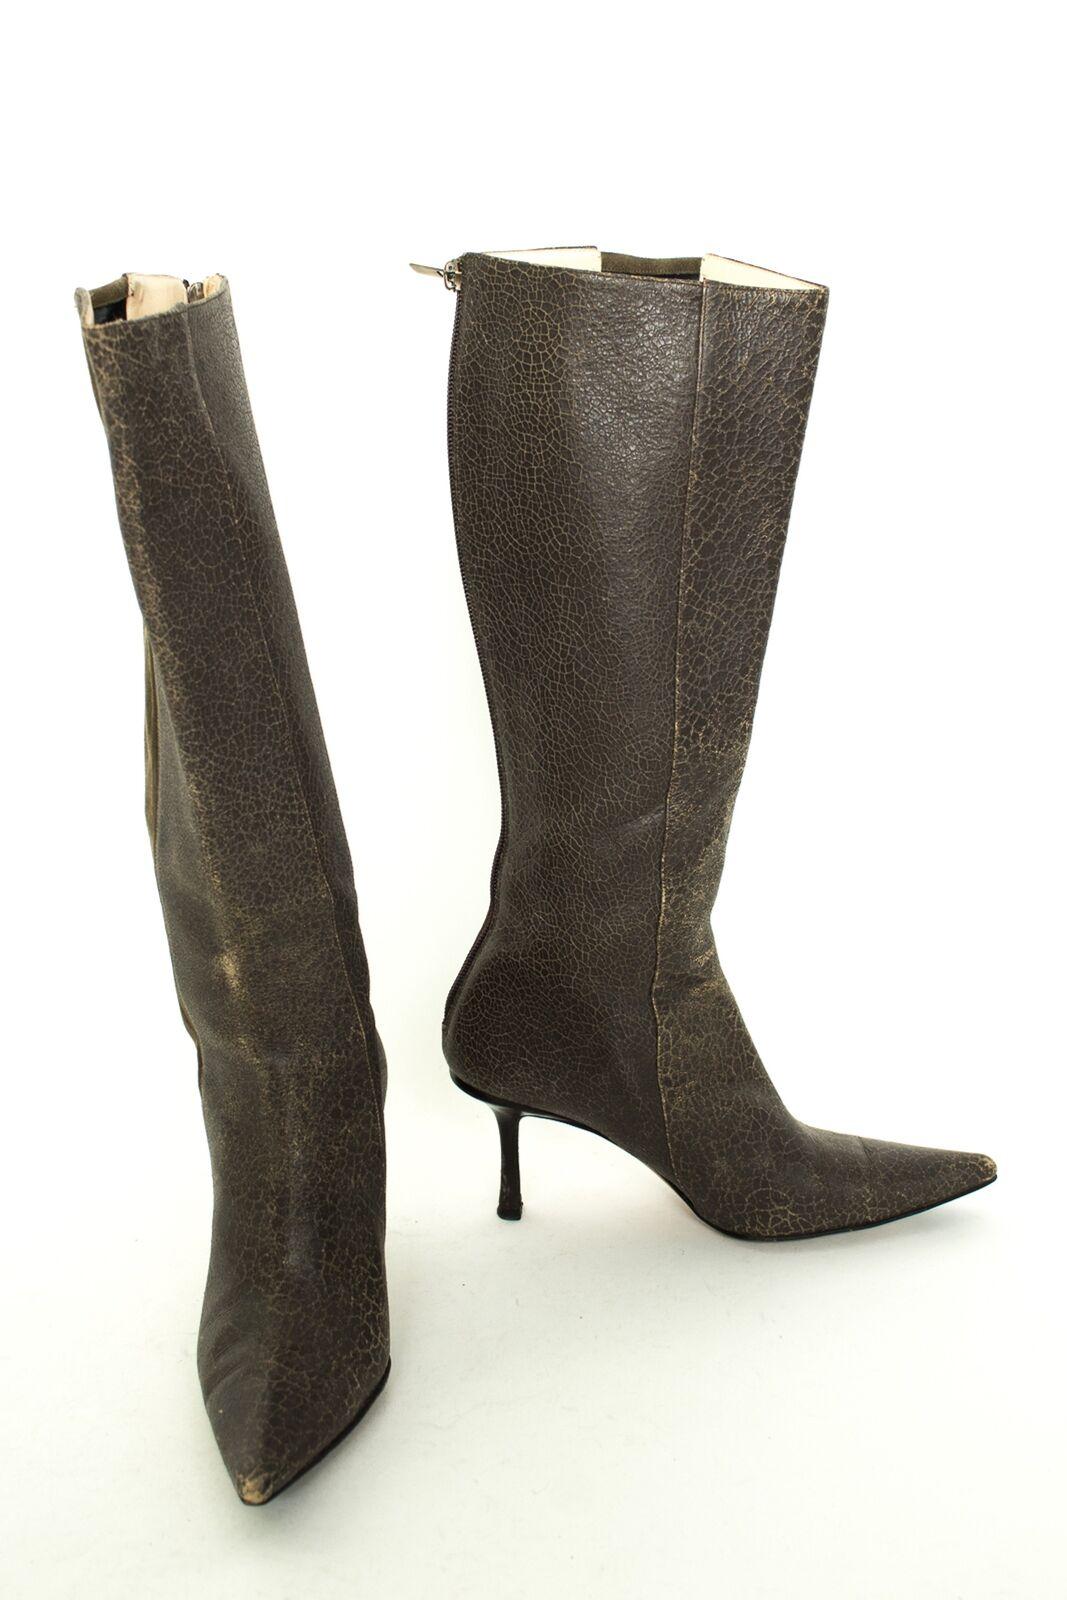 JIMMY CHOO Stiefel Gr. EU37,5 Damen Schuhe Stiefel High Heels Braunoliv Leder     Hochwertige Materialien